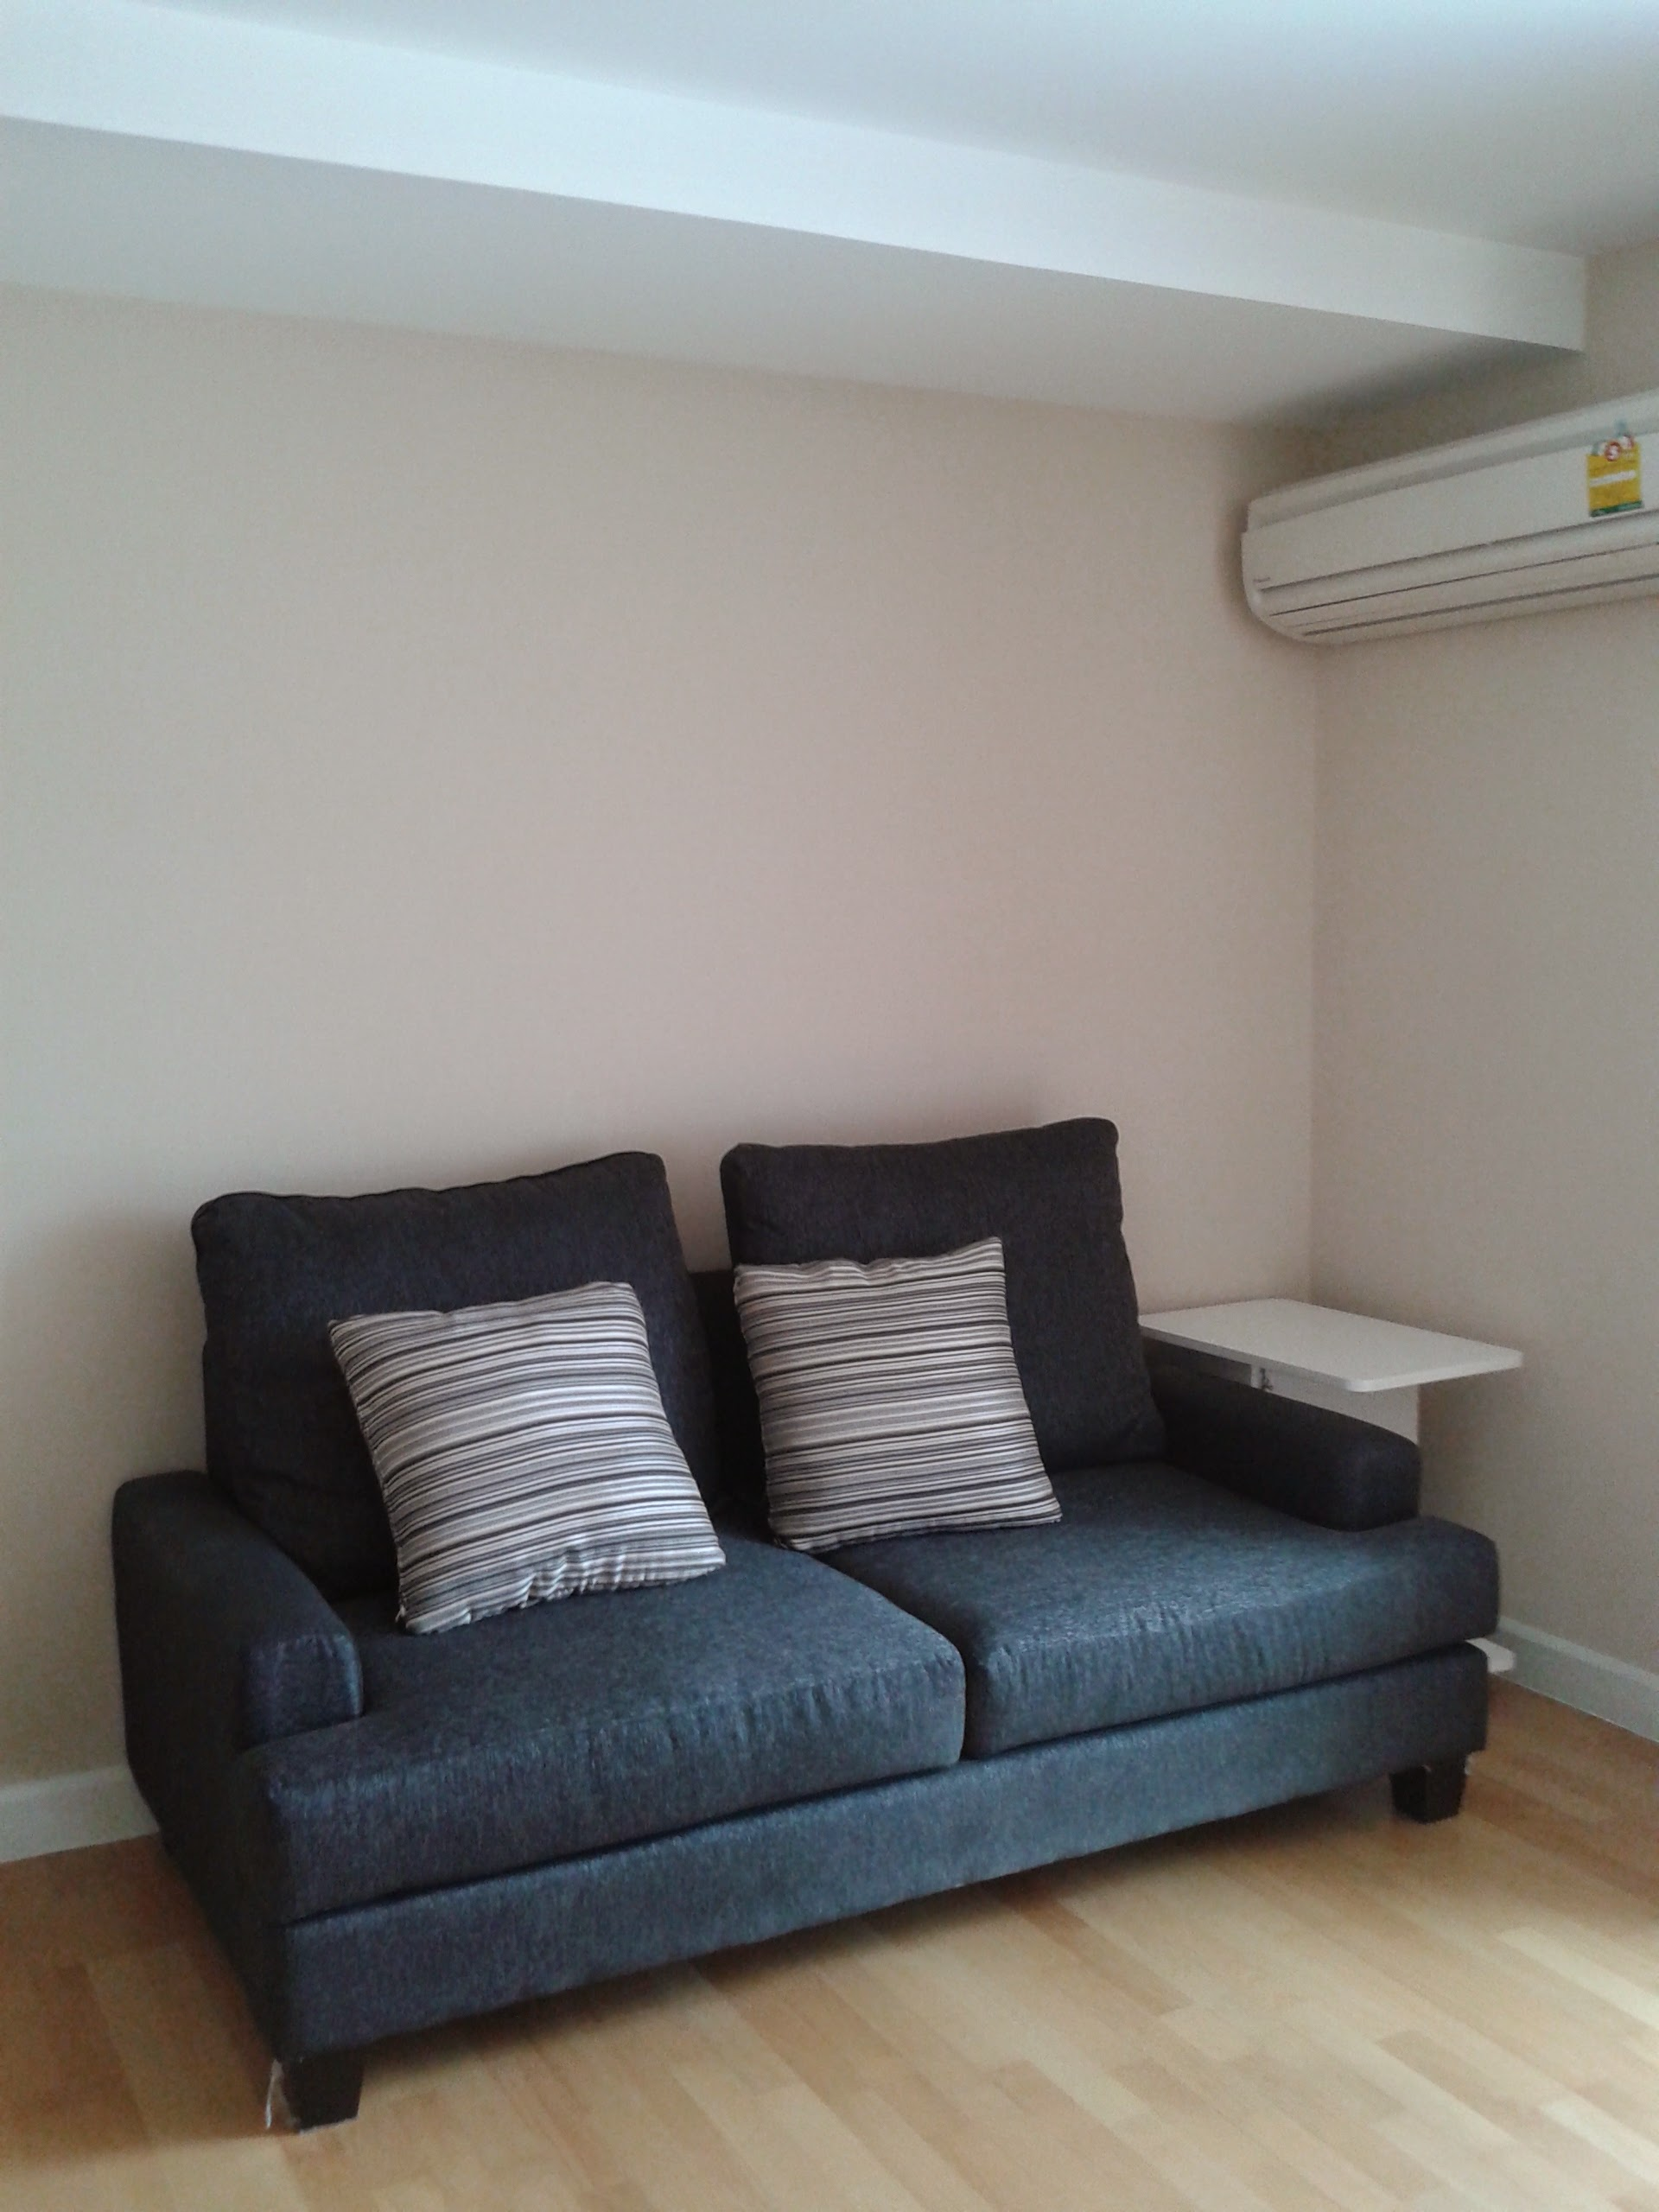 one bedroom condo for rent in ari promove bangkok one bedroom condo with loft lakelouiseinn